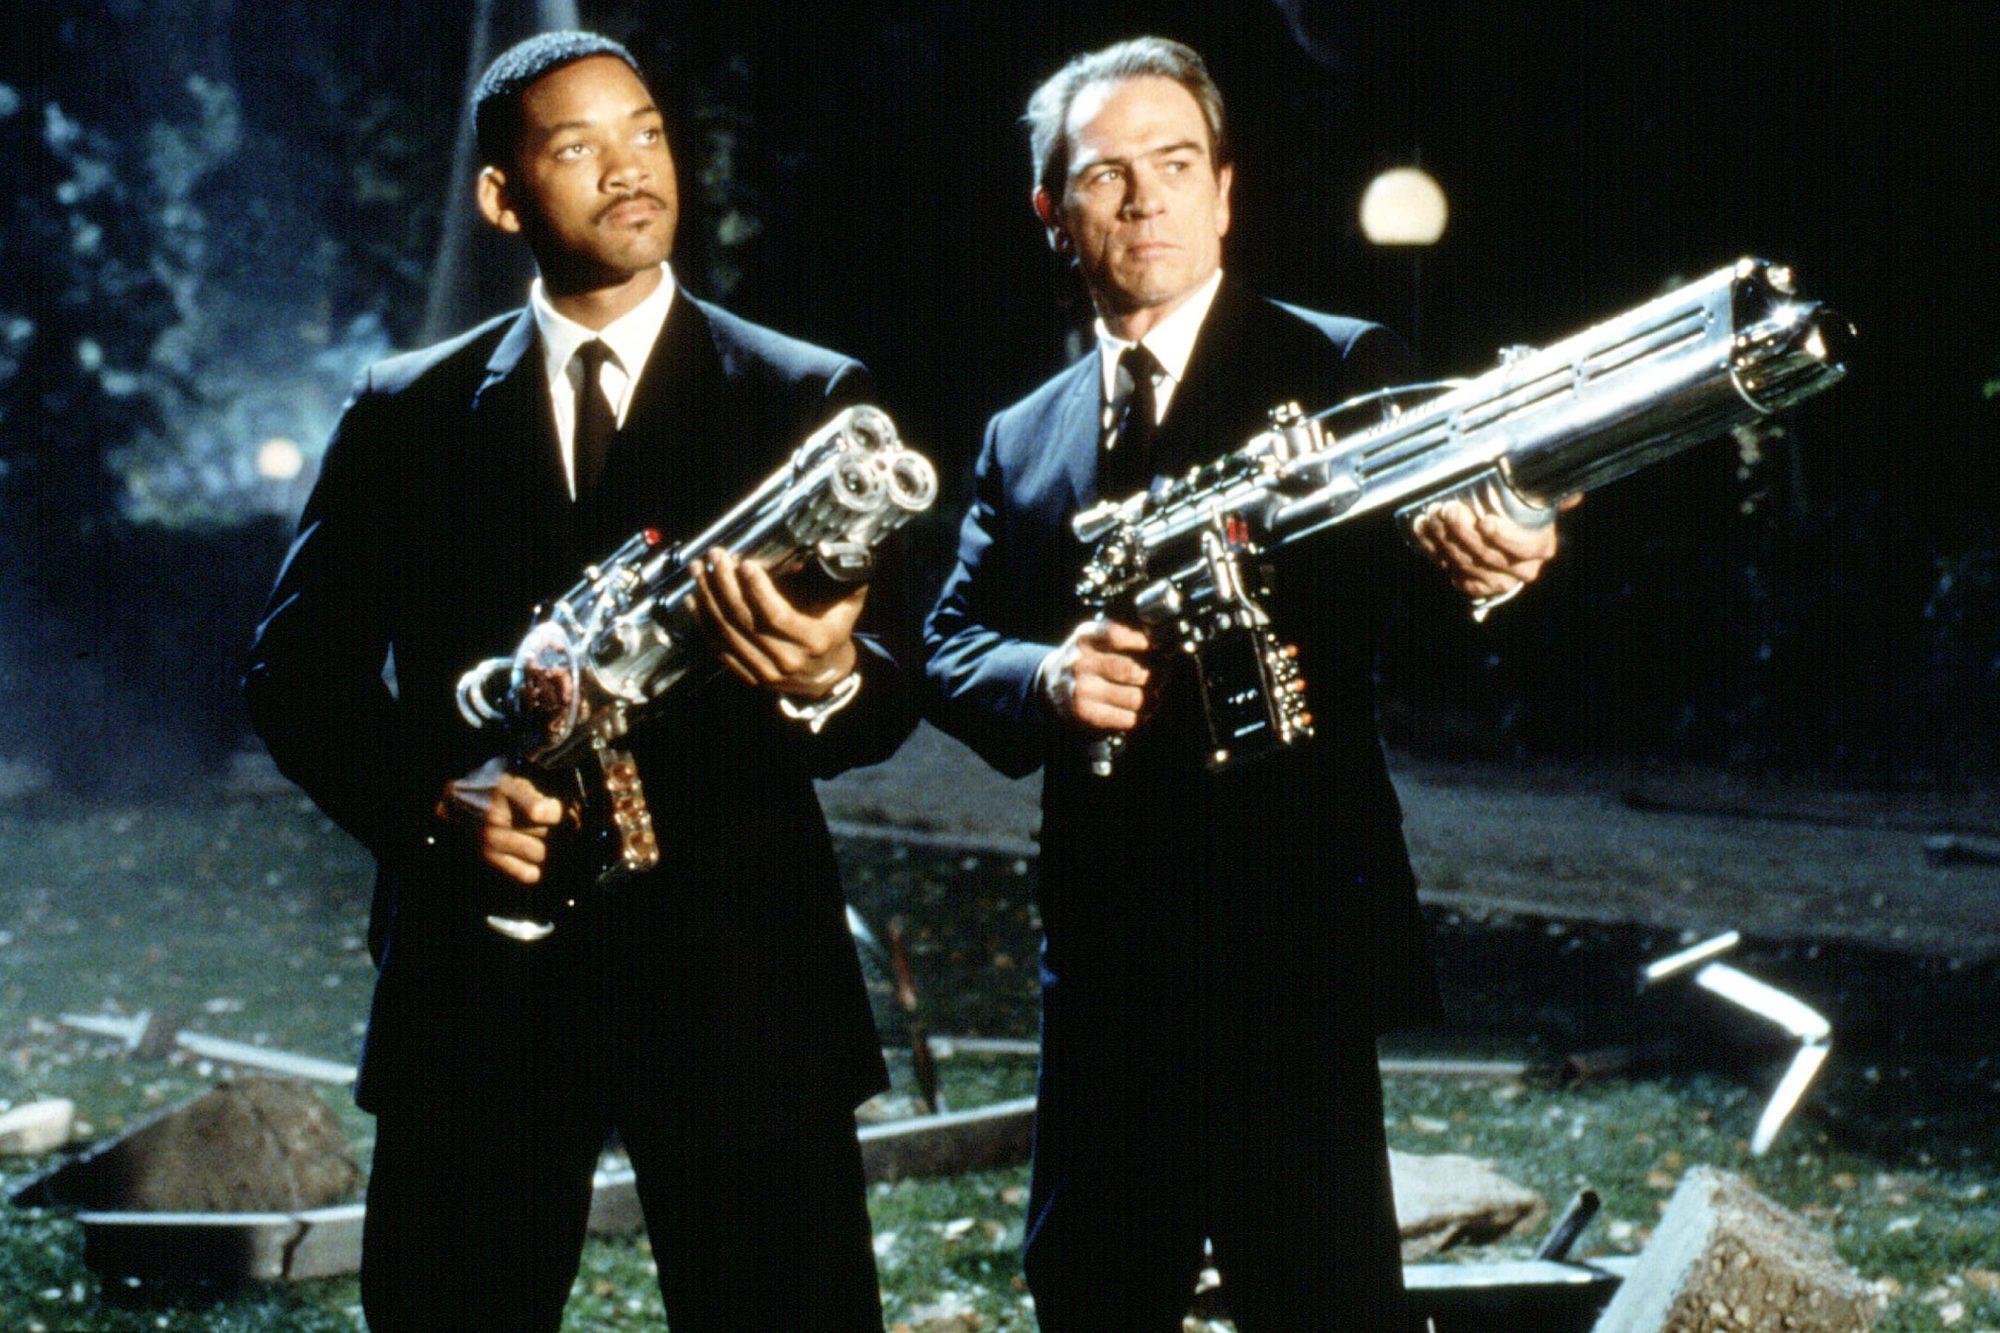 MEN IN BLACK, Will Smith, Tommy Lee Jones, 1997